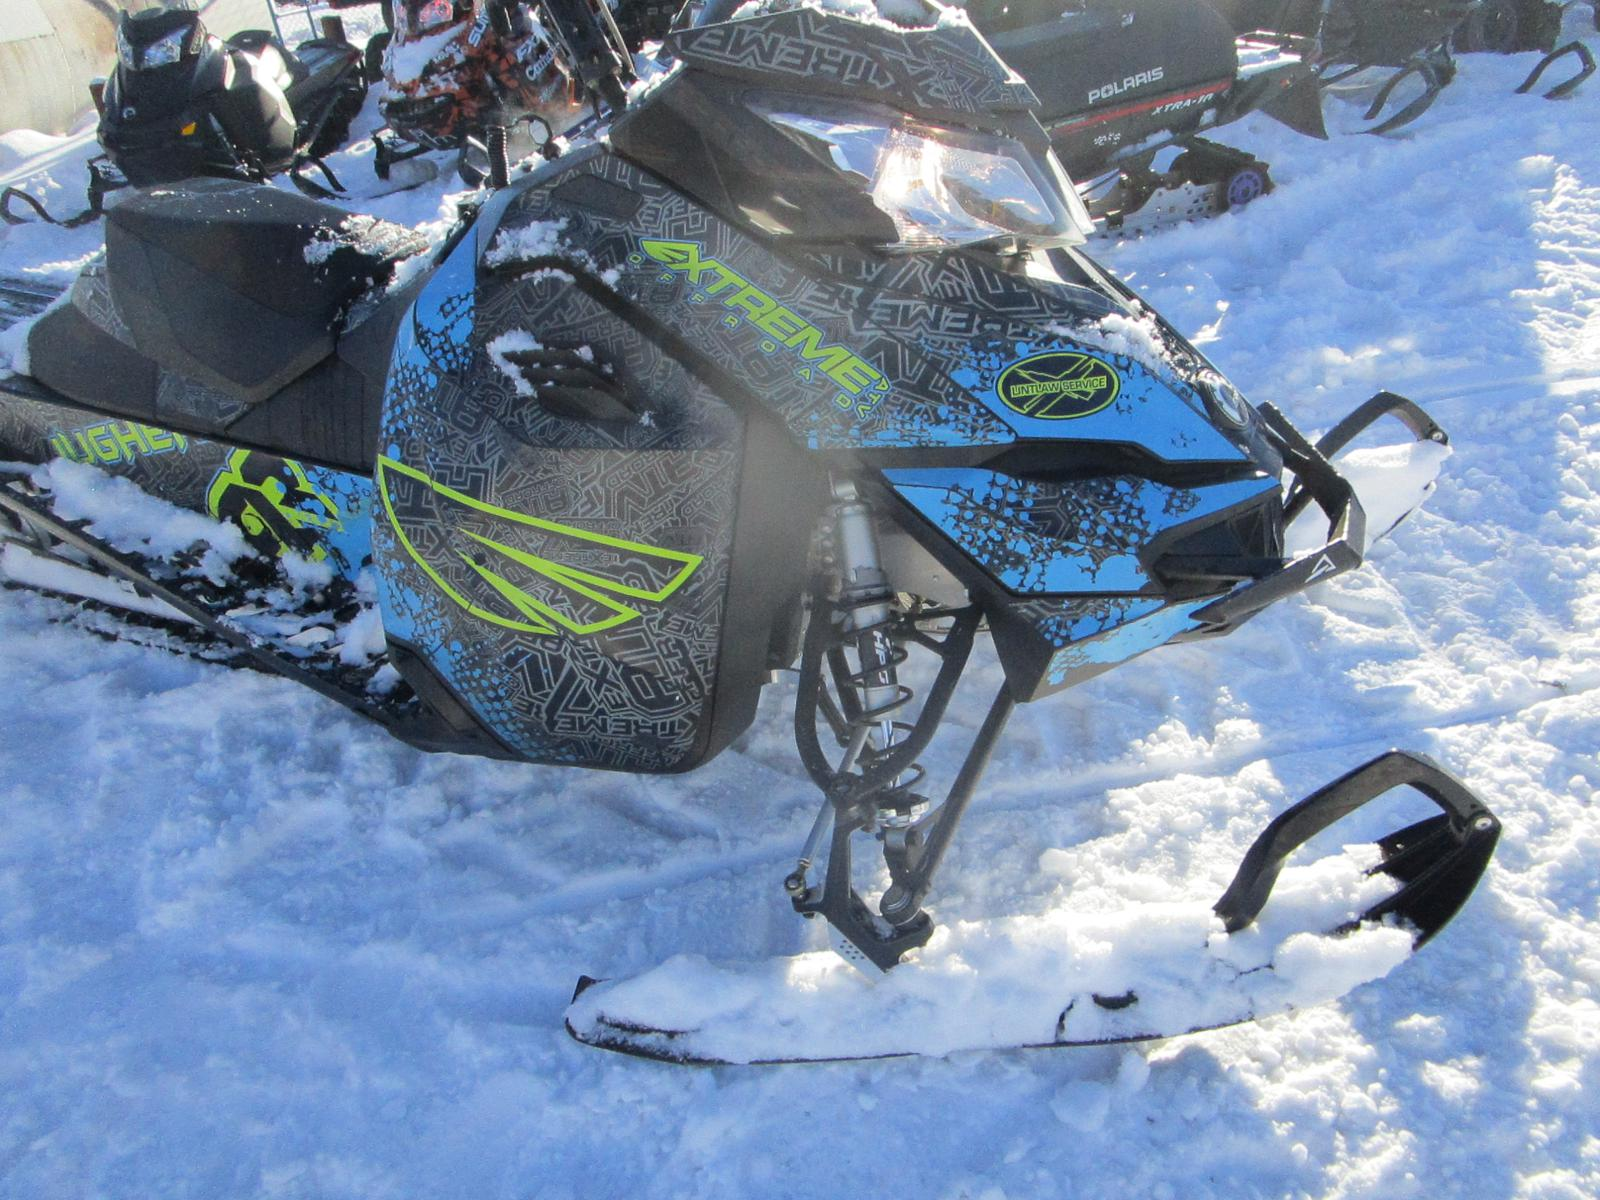 2016 Ski-Doo Summit Sp 800 Etec elc start